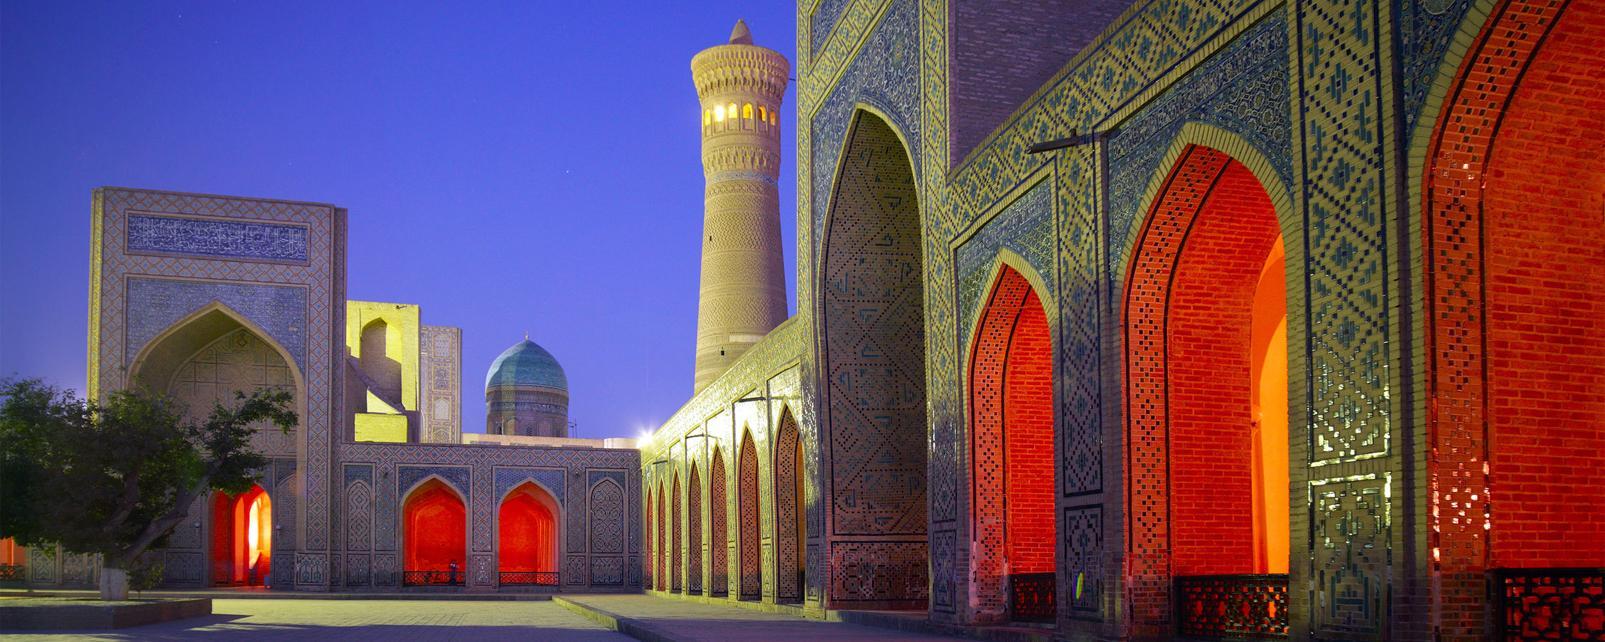 Asie, Ouzbékistan, Boukhara, palais, architecture,